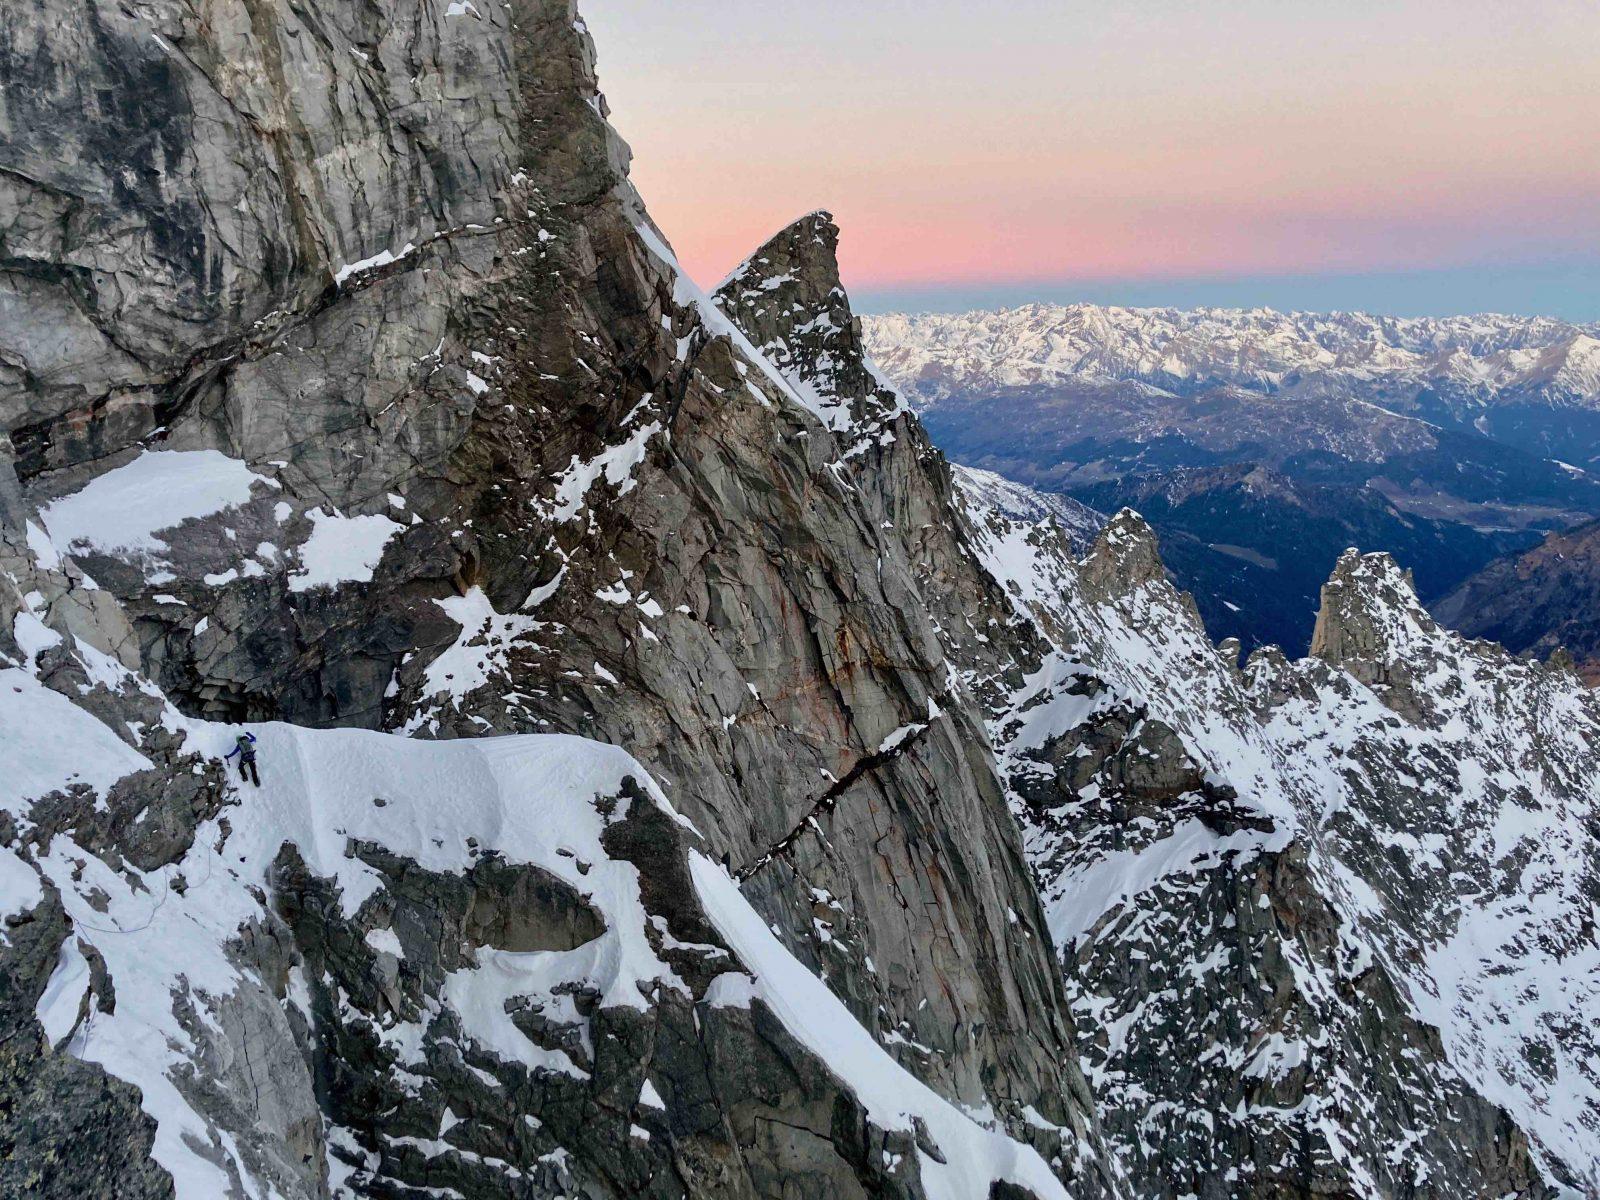 Sagwand-Nordwand, eine wirklich mächtige Wand, Foto: Ines Papert und Luka Lindič |Climbers Paradise